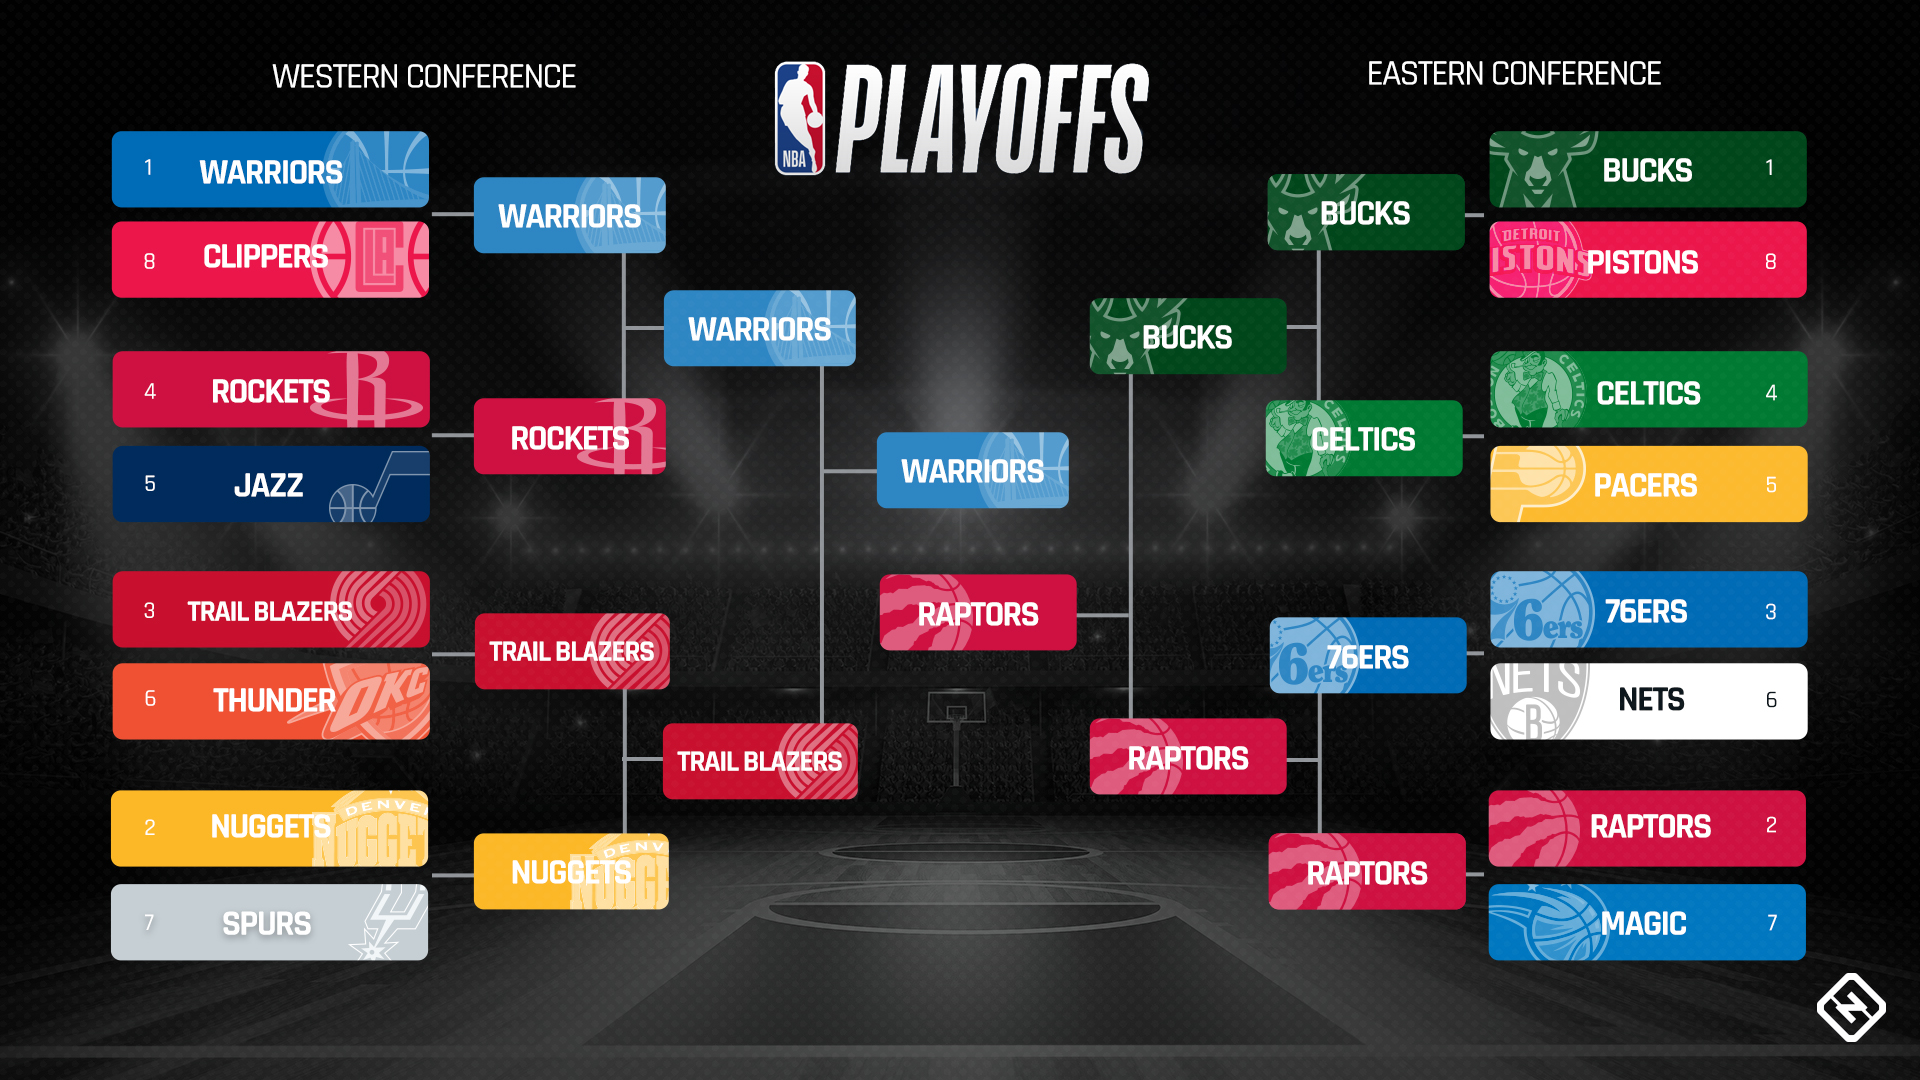 image regarding Printable Nba Playoff Bracket referred to as NBA playoffs agenda 2019: Finish bracket, dates, occasions, Television